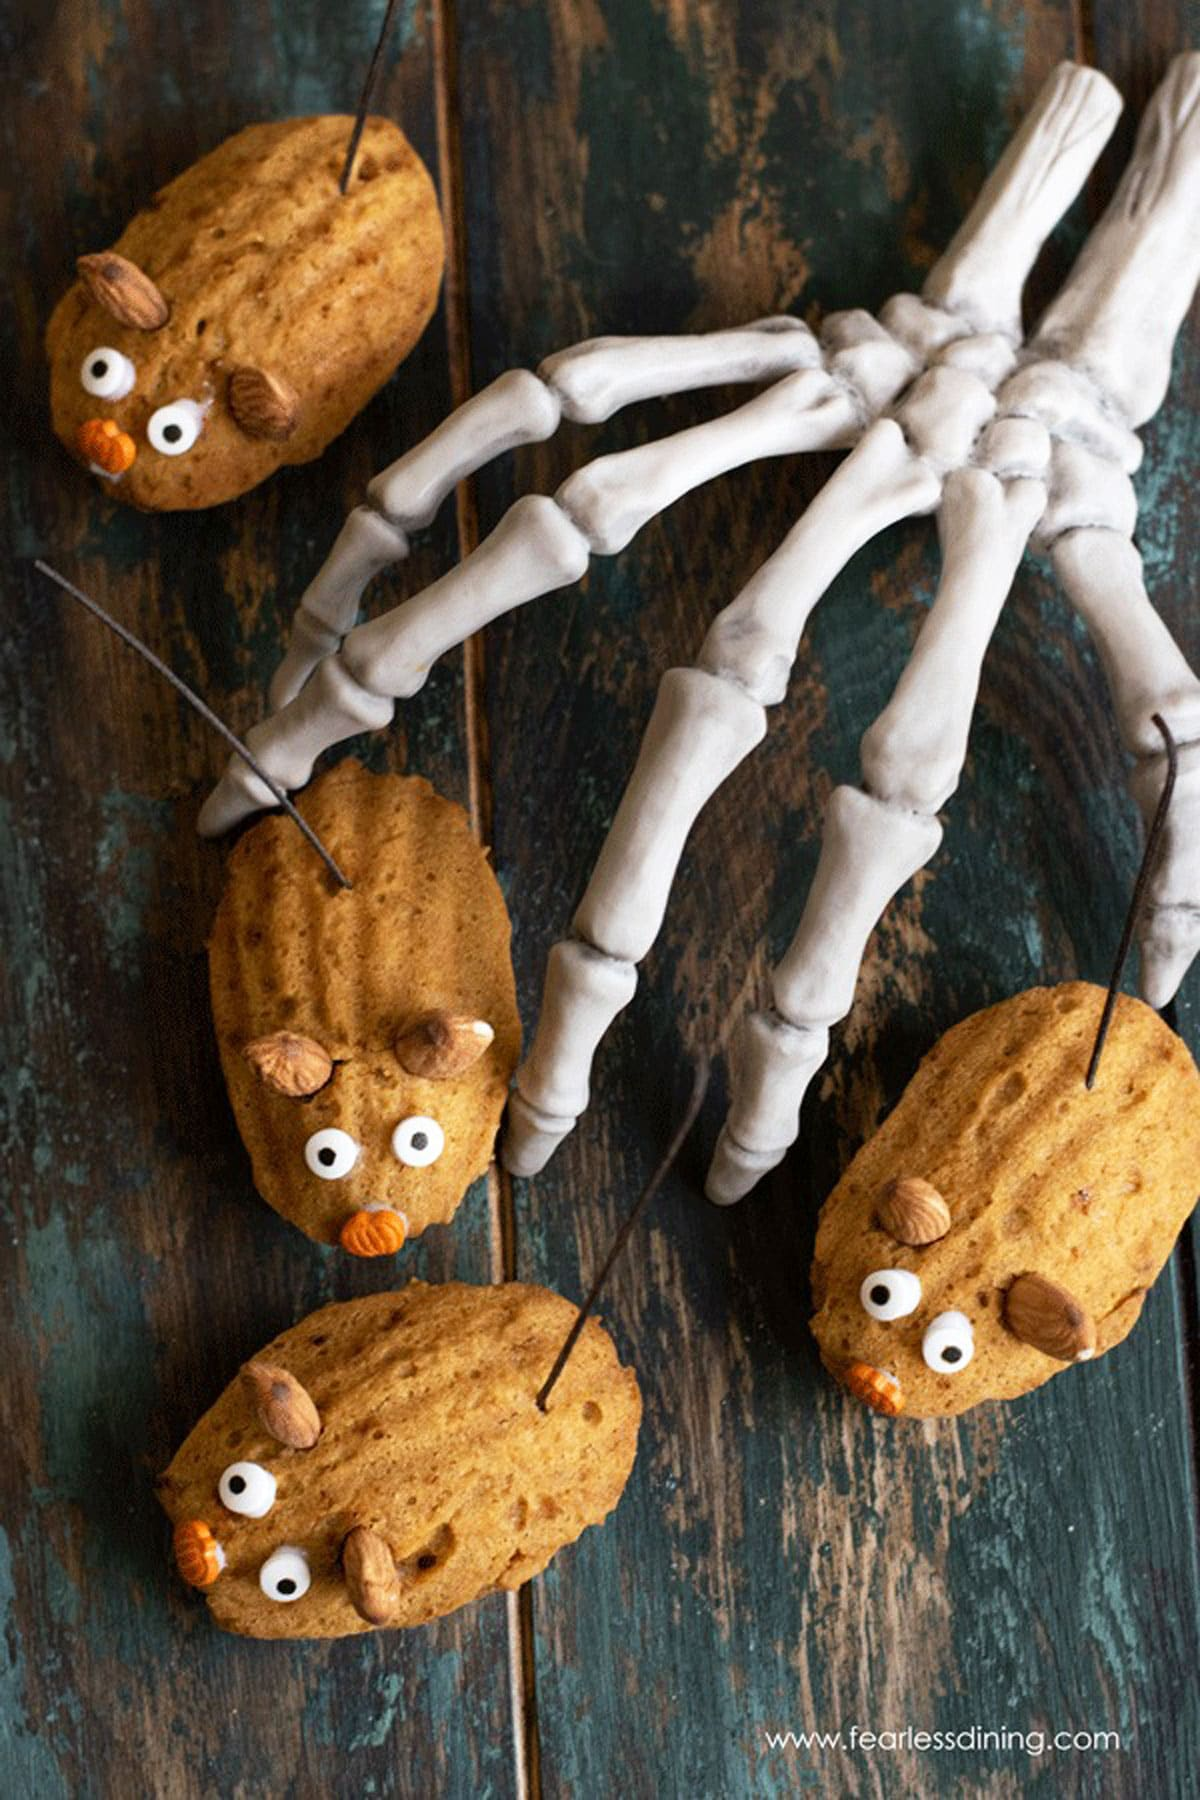 pumpkin madeleines decorated as Halloween mice